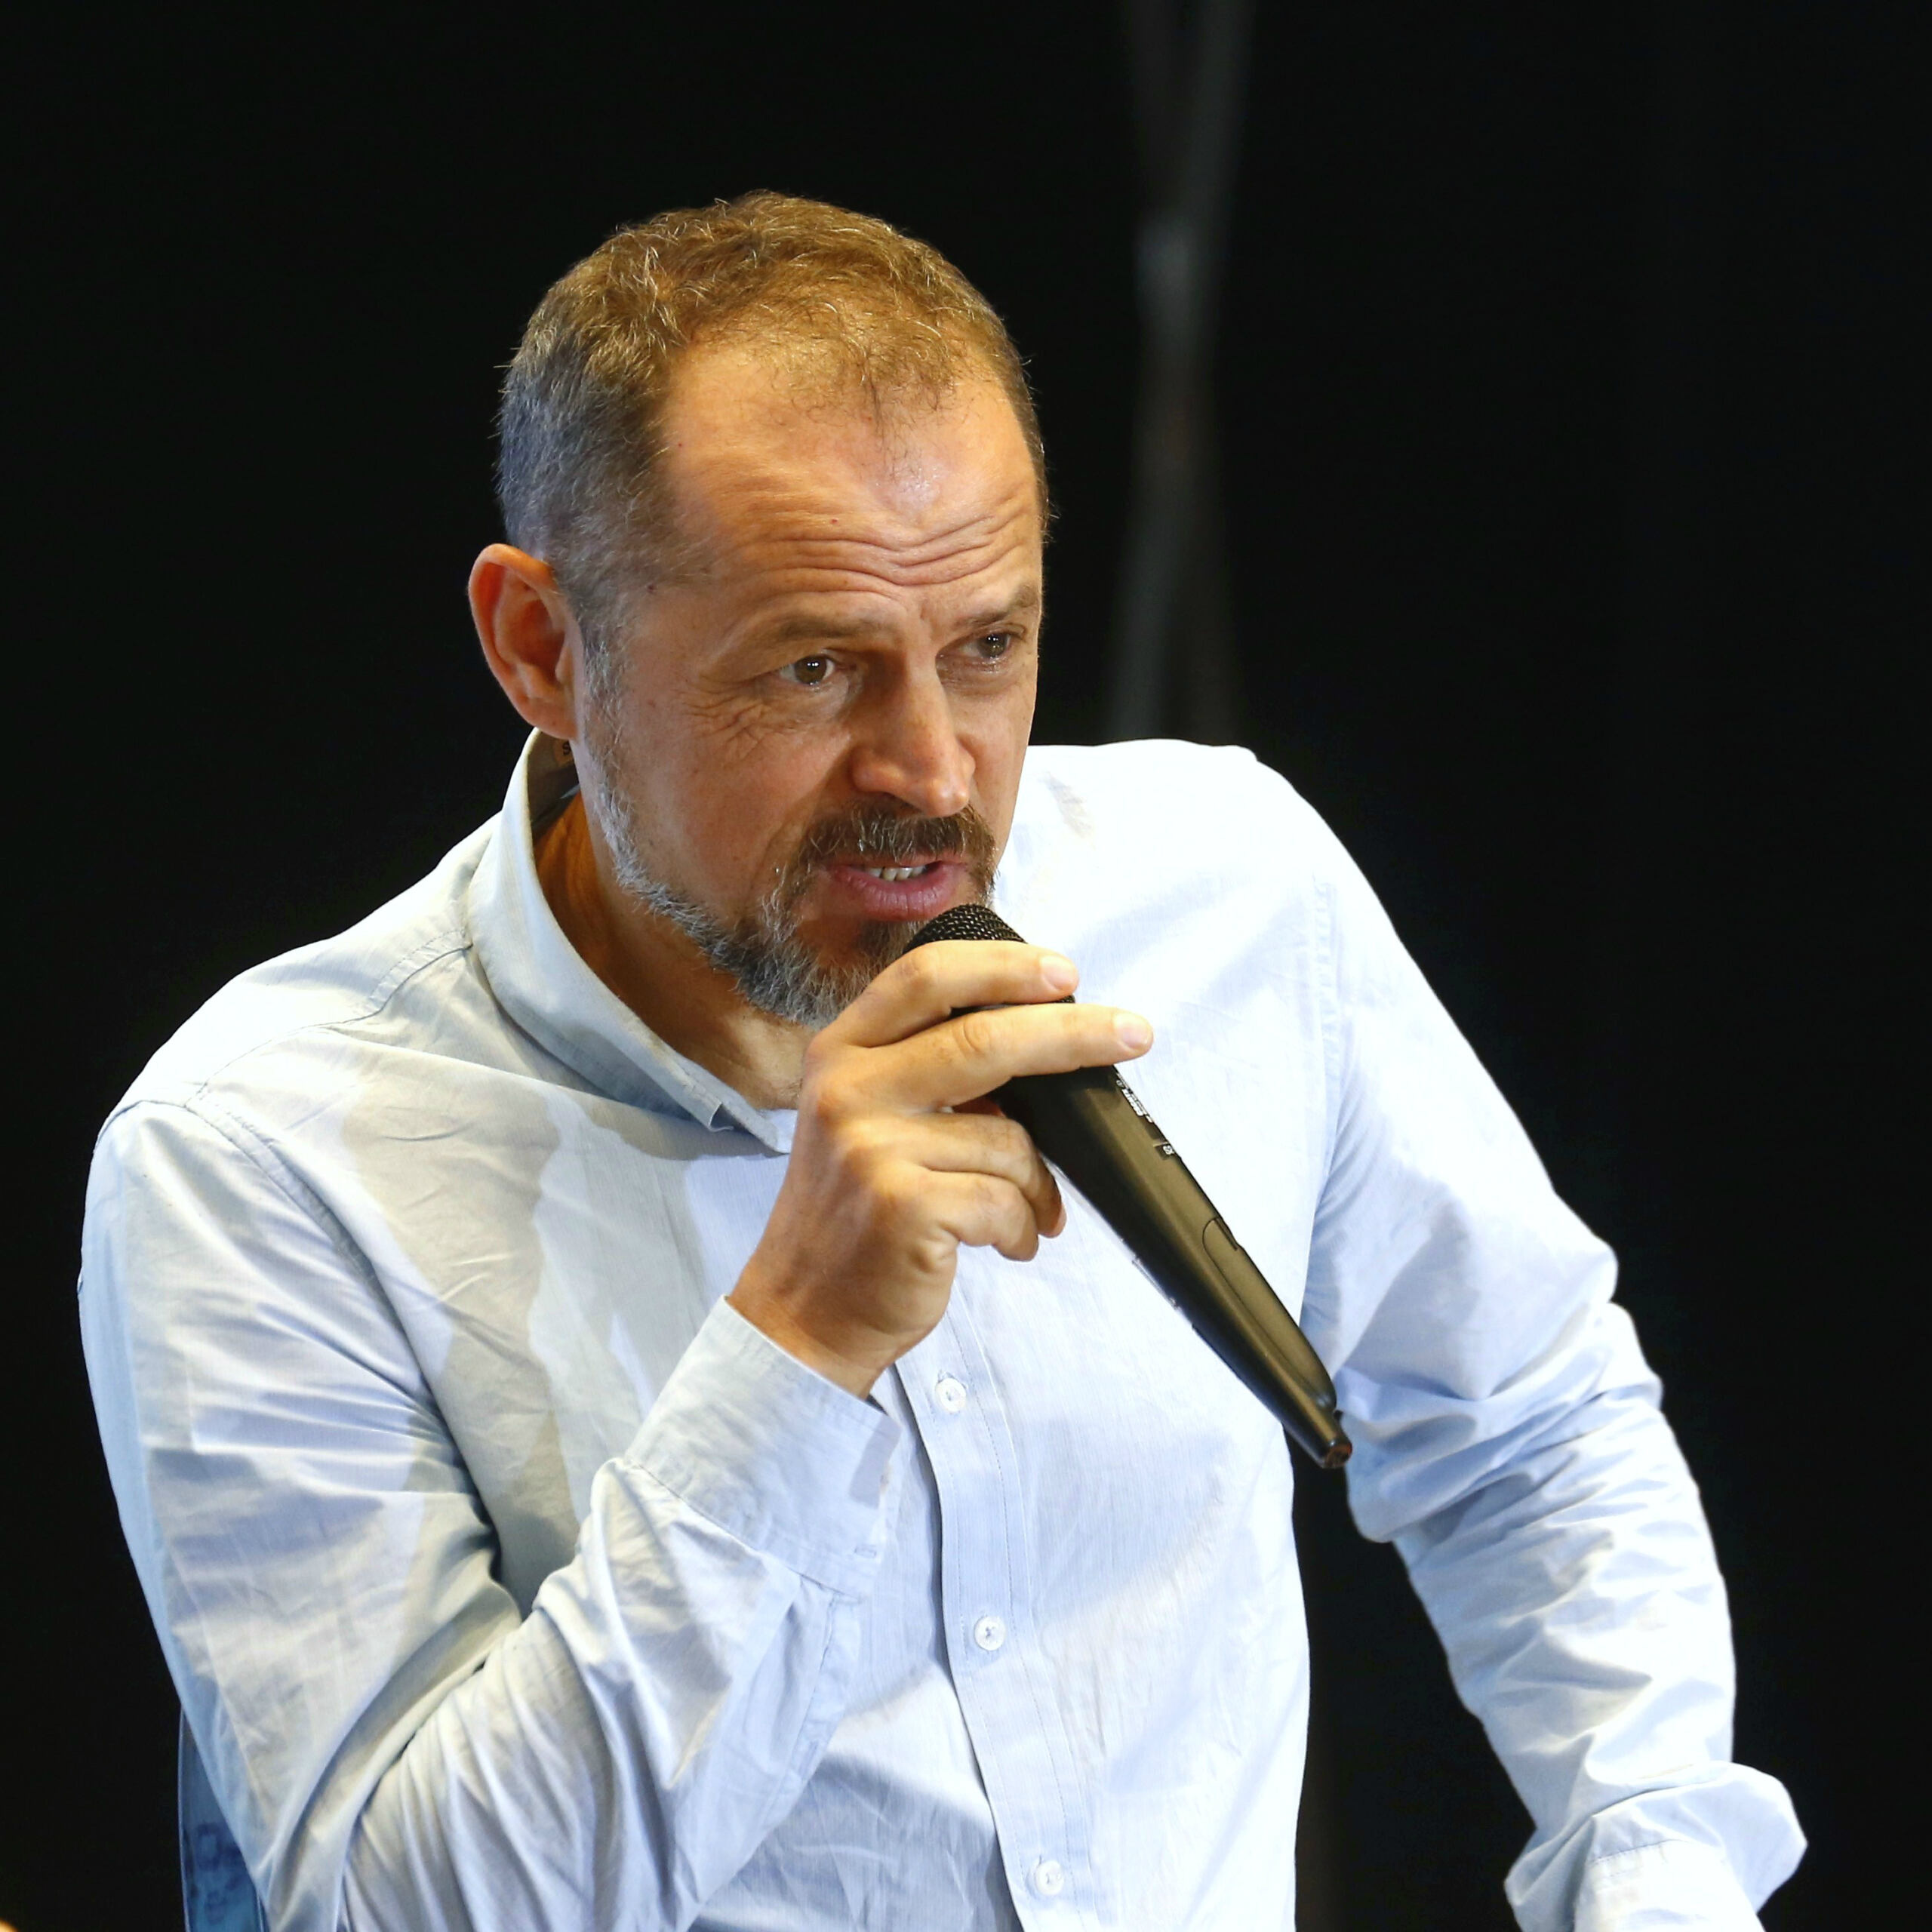 Rafał Wnuk